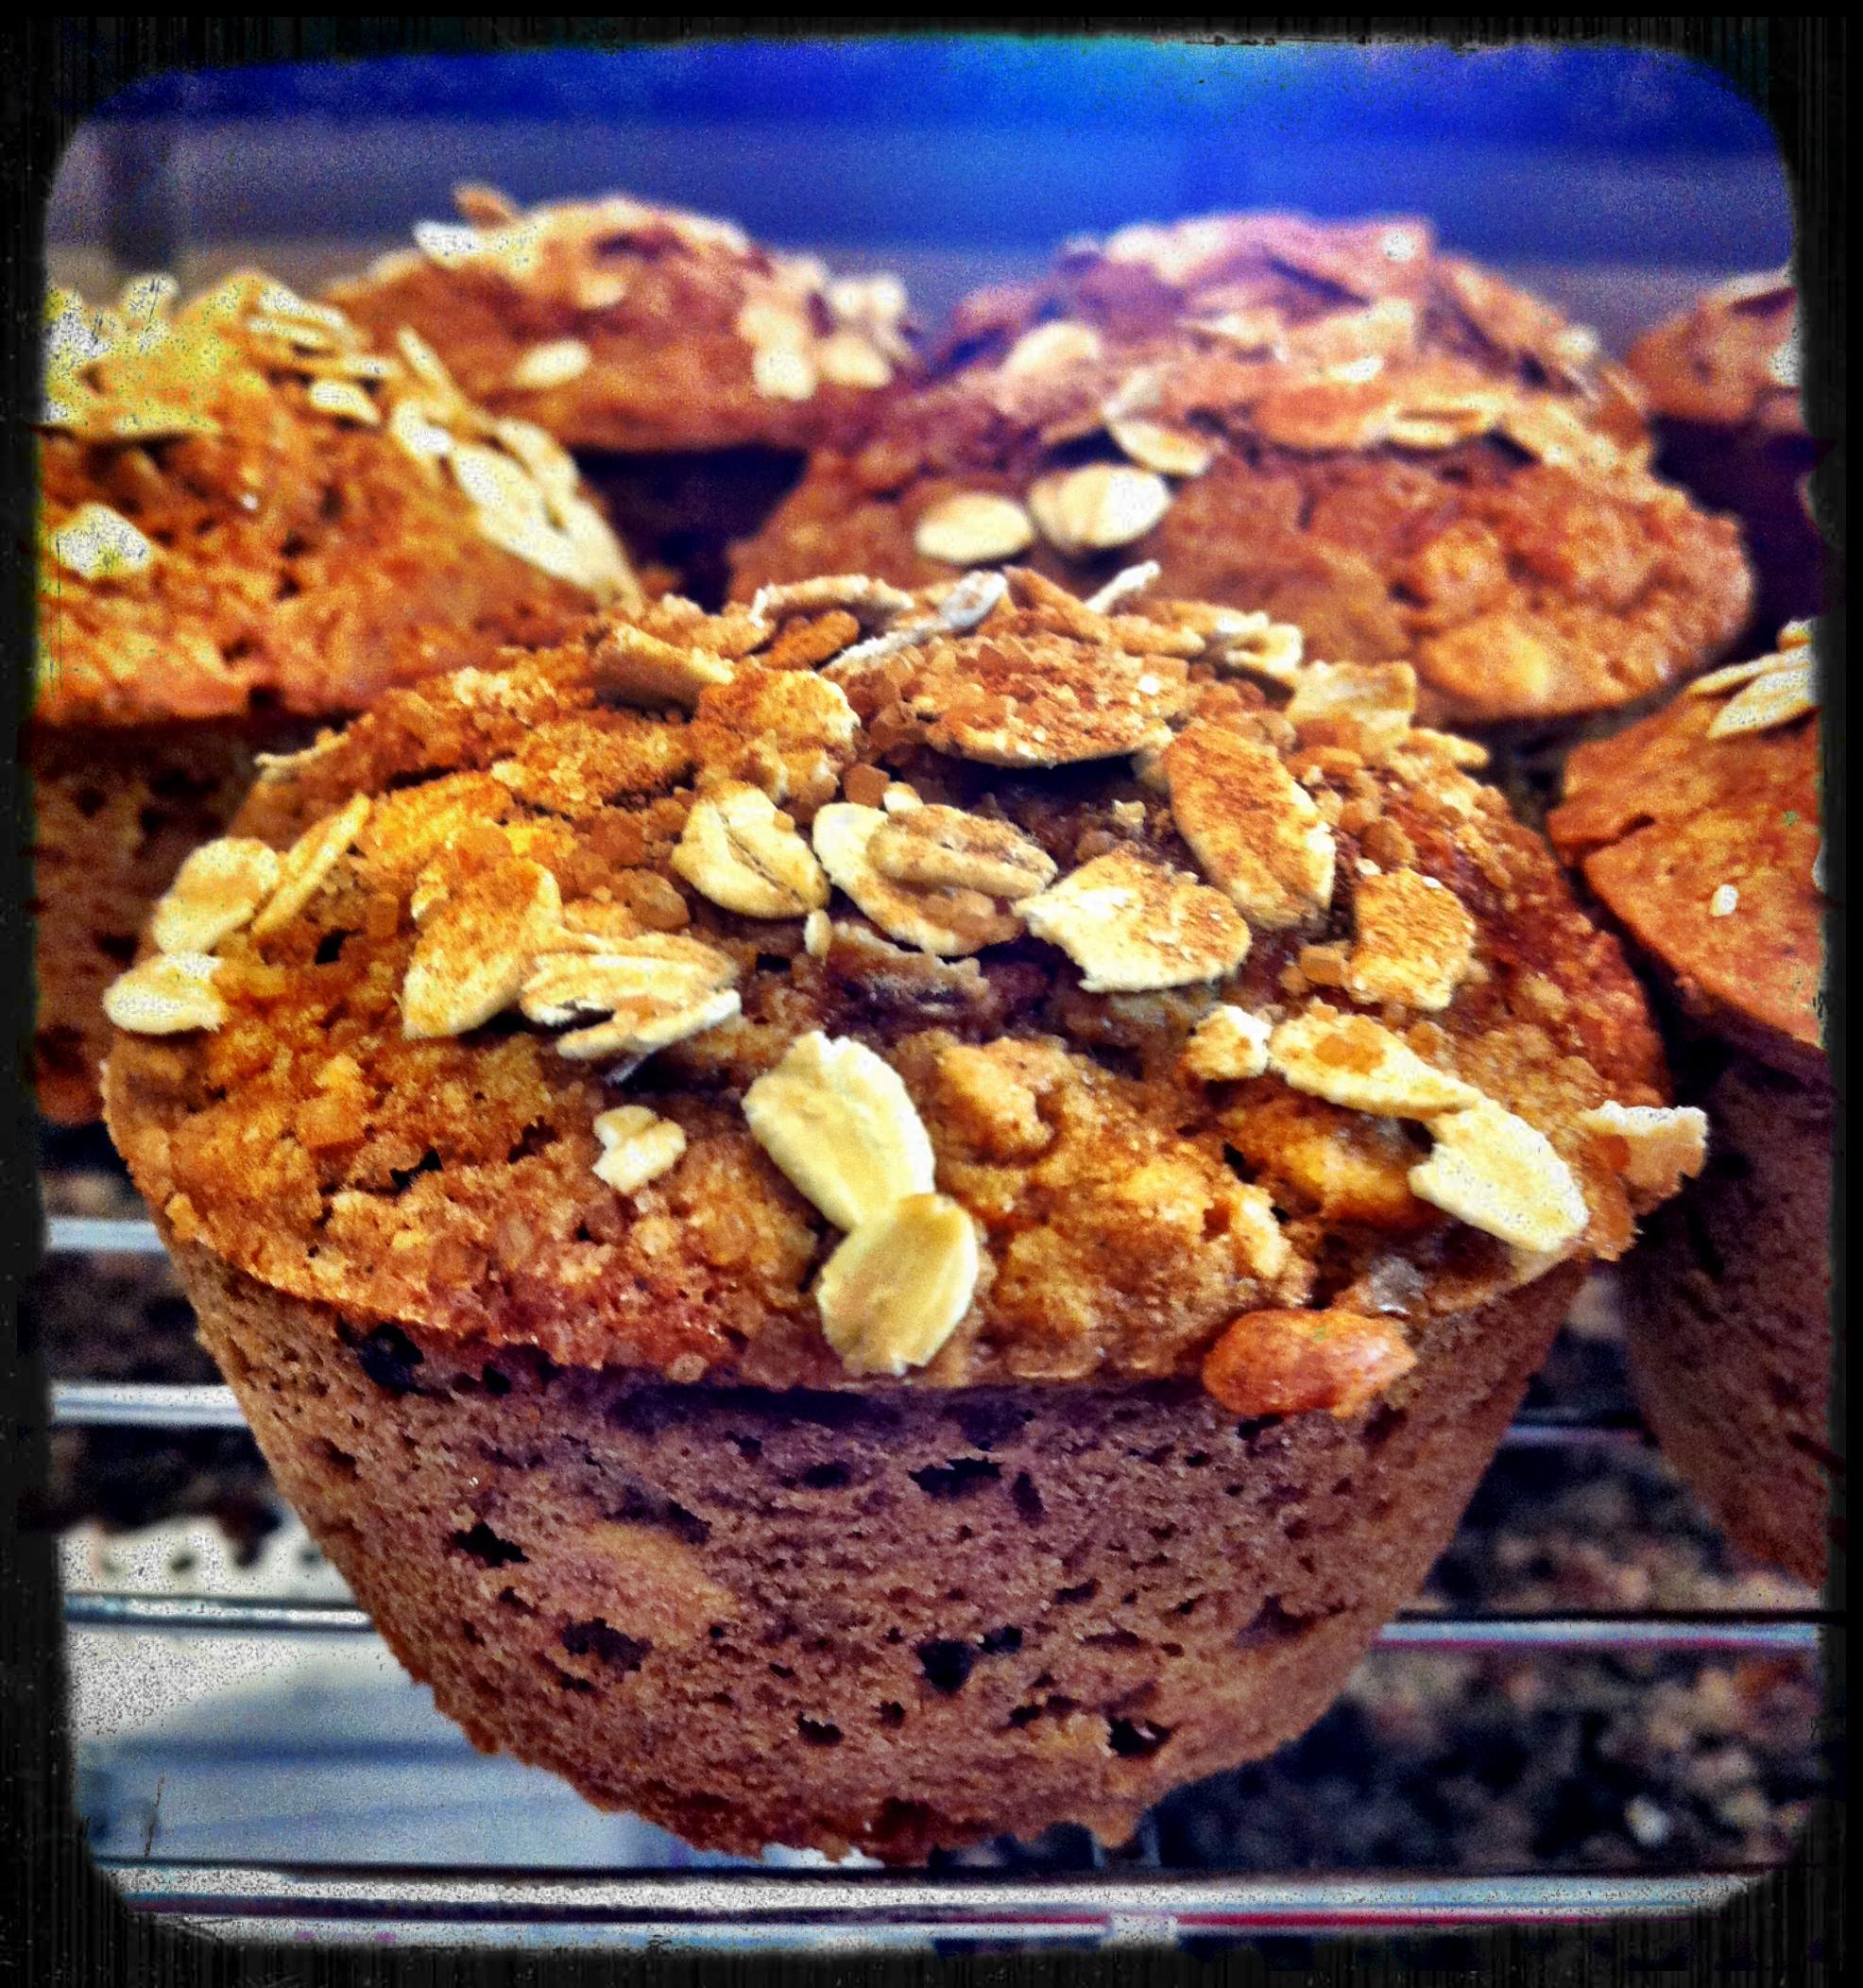 ... Raisin Oatmeal Muffin Recipe. Vegan, Oil-Free, Low-Fat, Wheat-Free